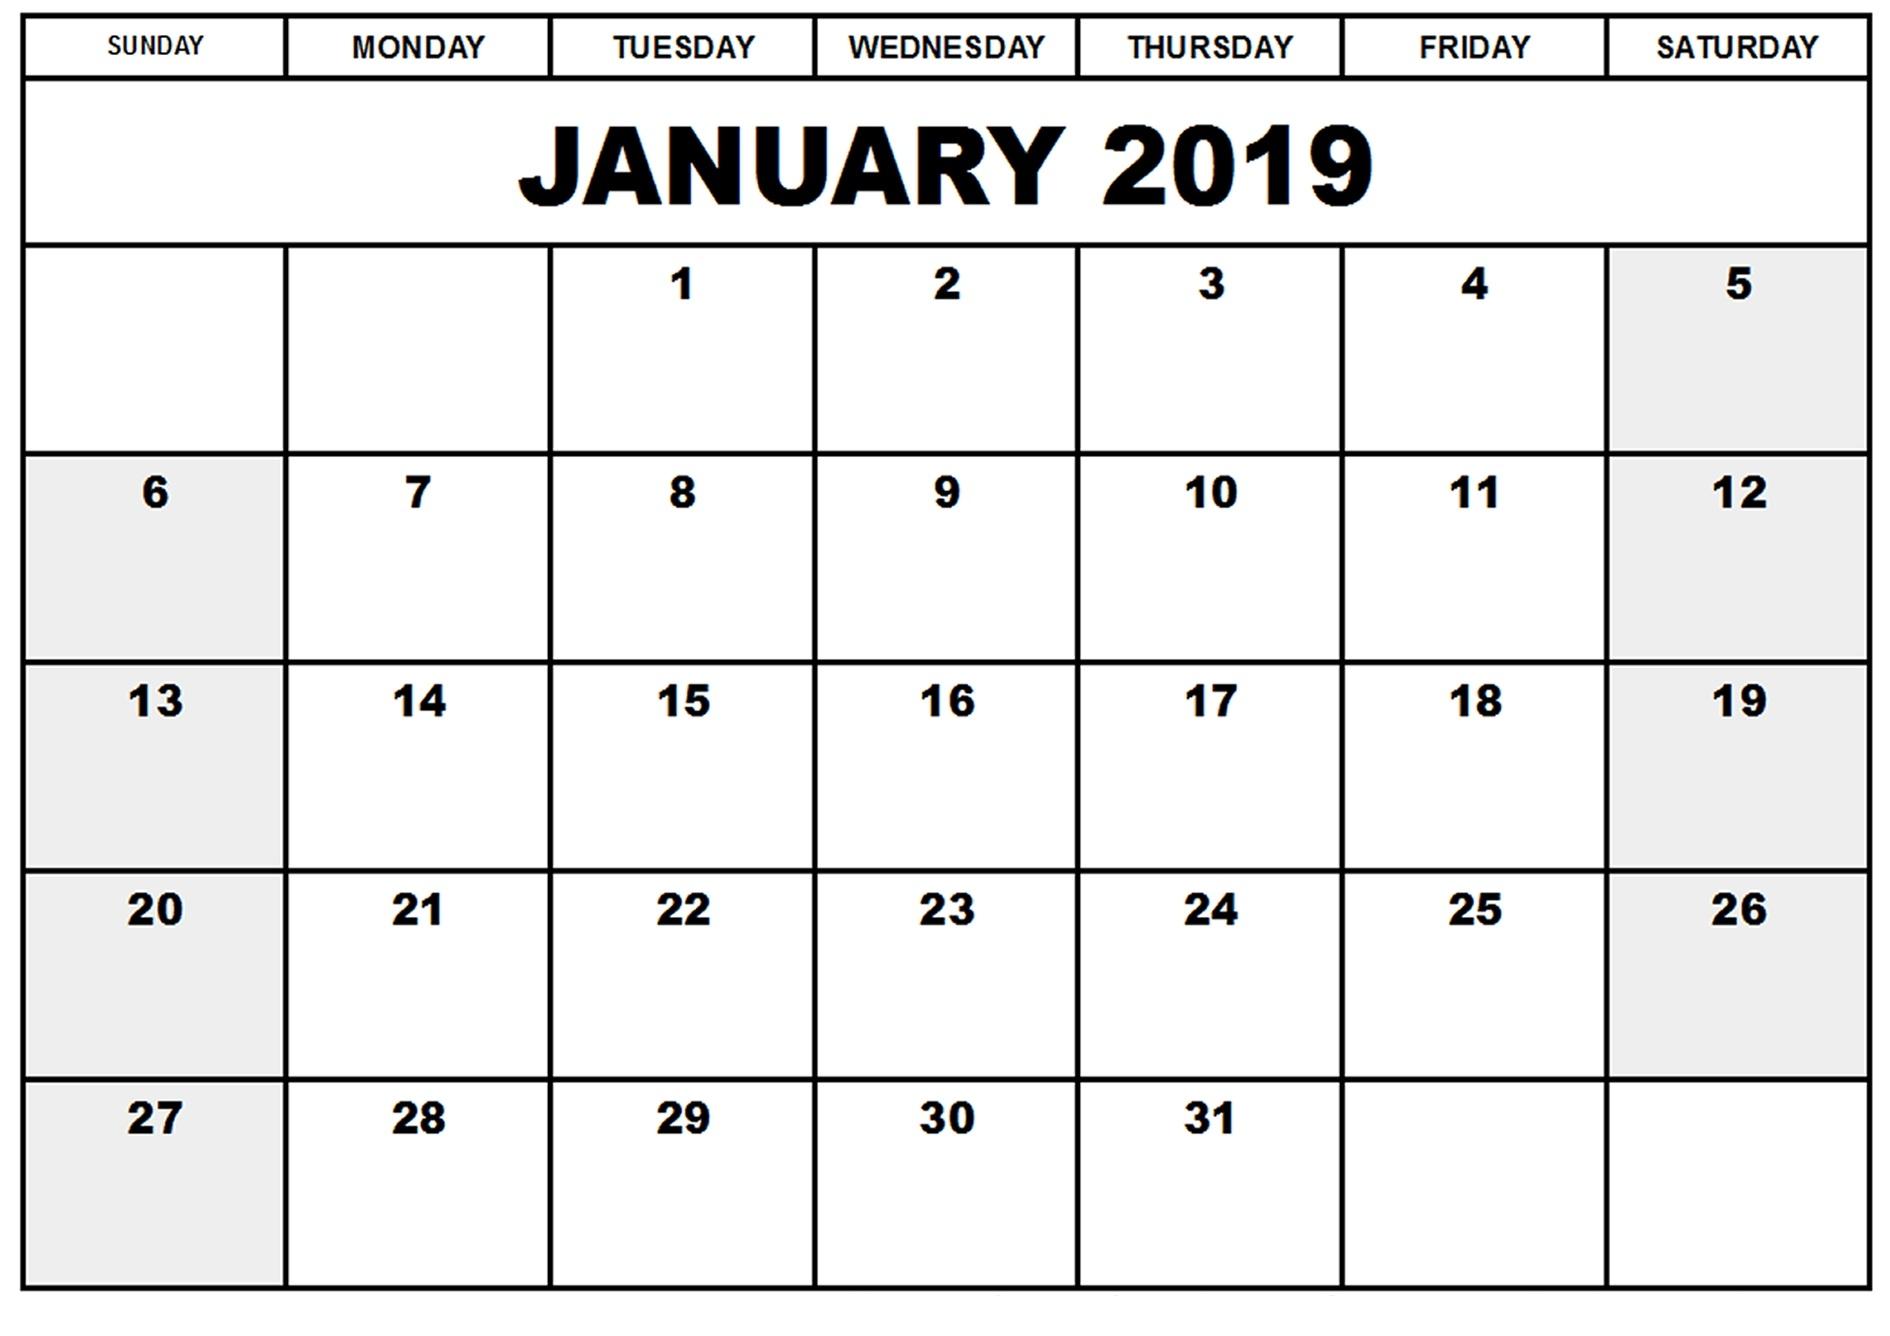 Printable Blank 2019 January Calendar Excel - Free Printable